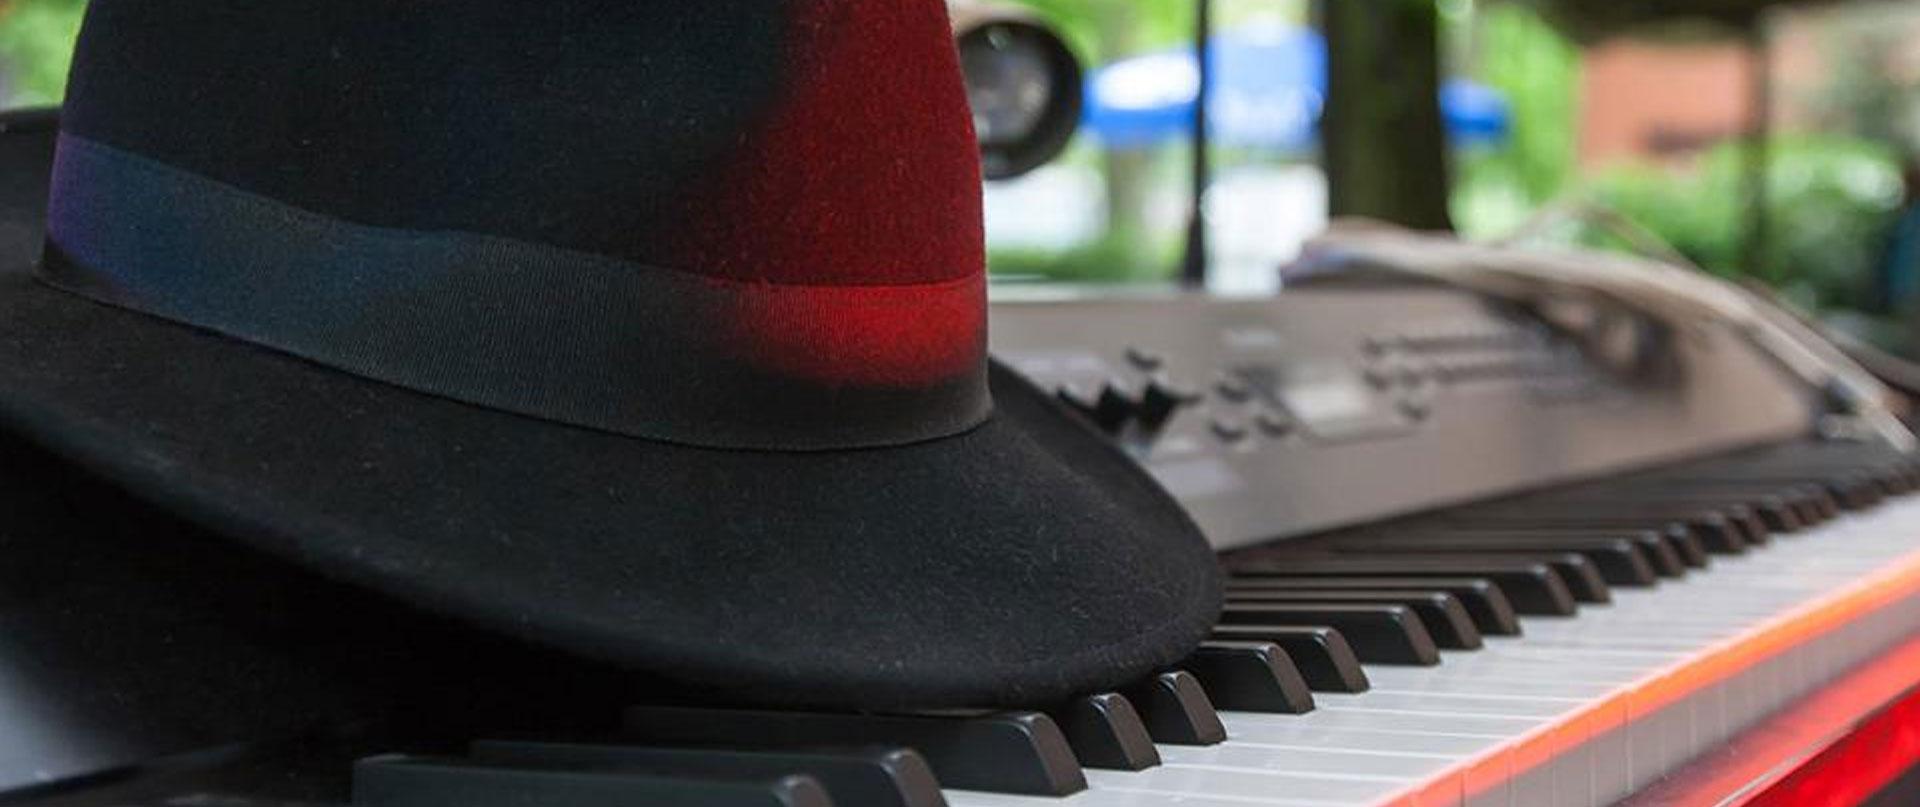 klavier-hut